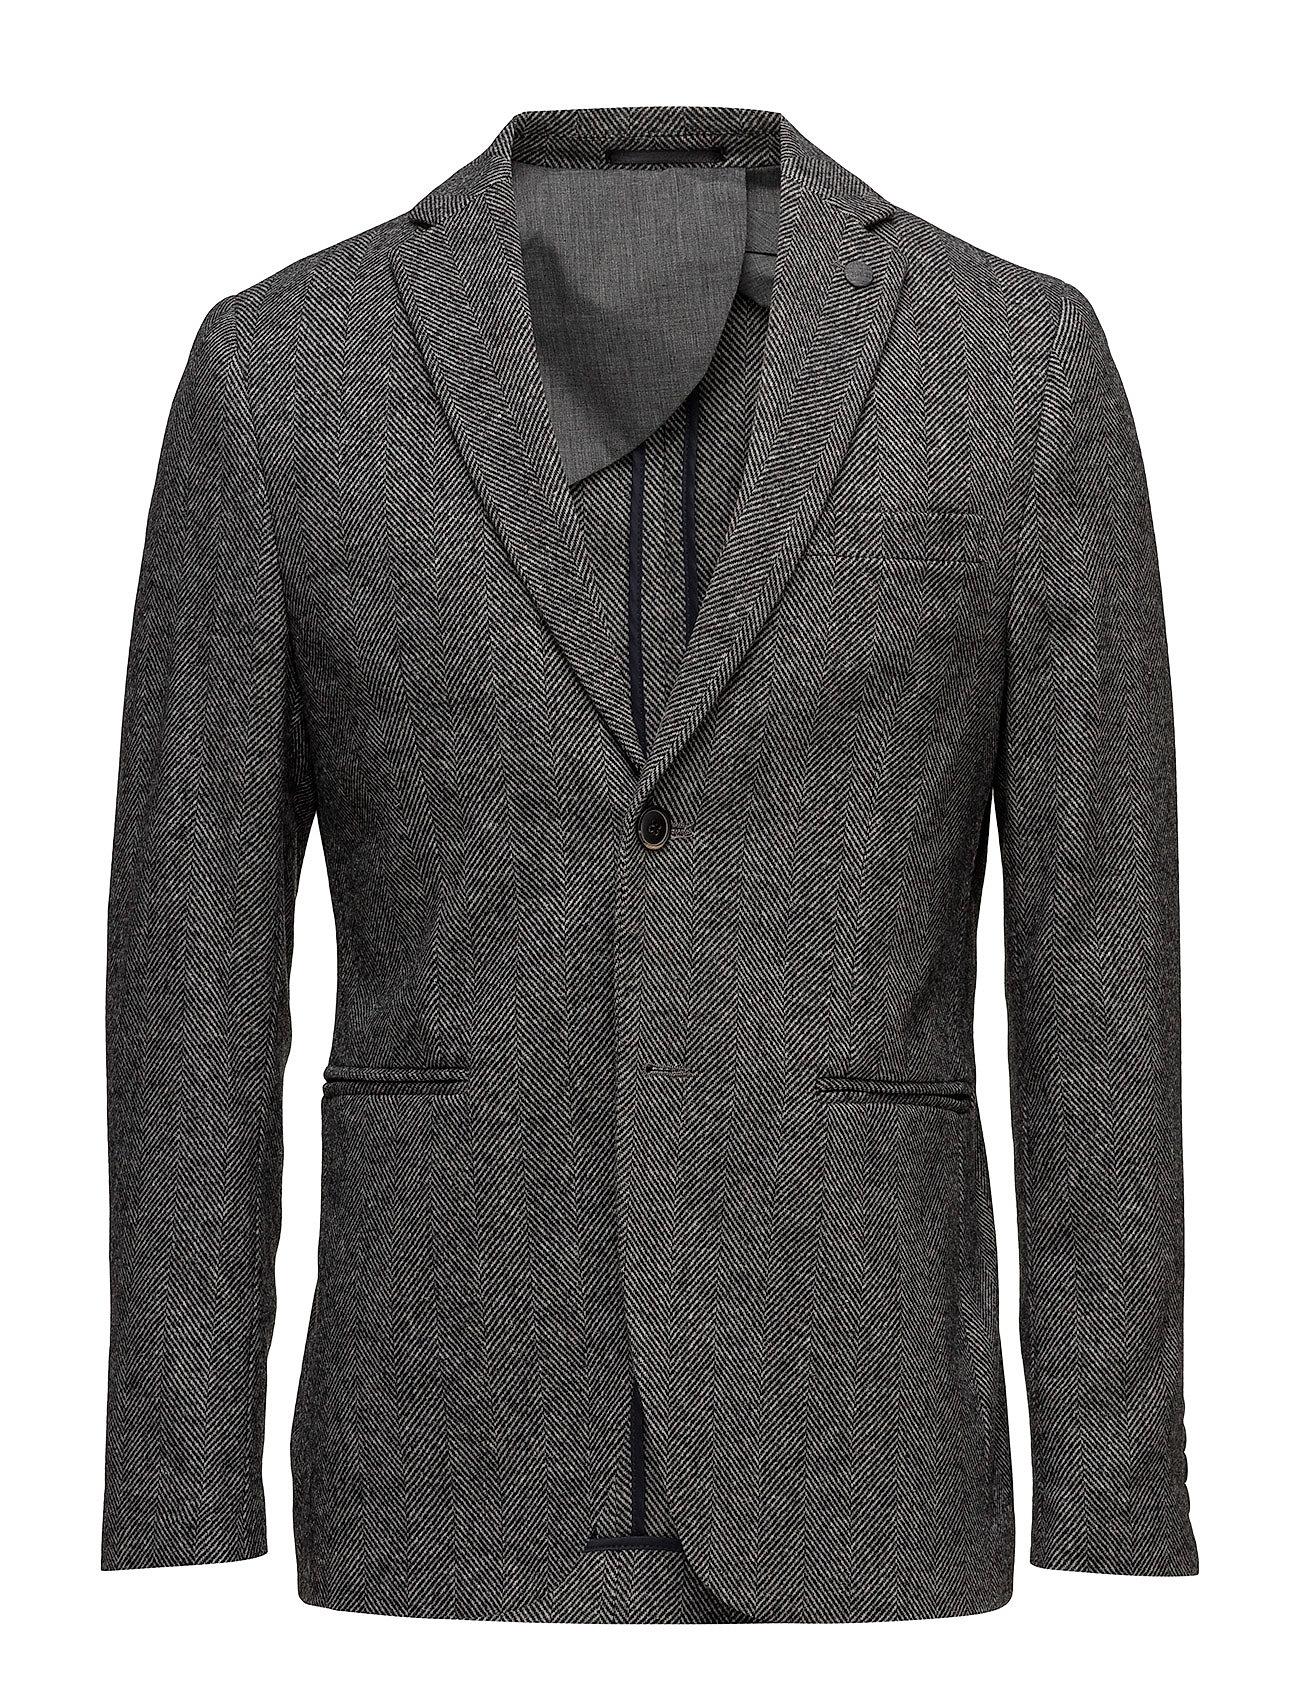 Shdone-Duncan Blazer Selected Homme Suits & Blazers thumbnail